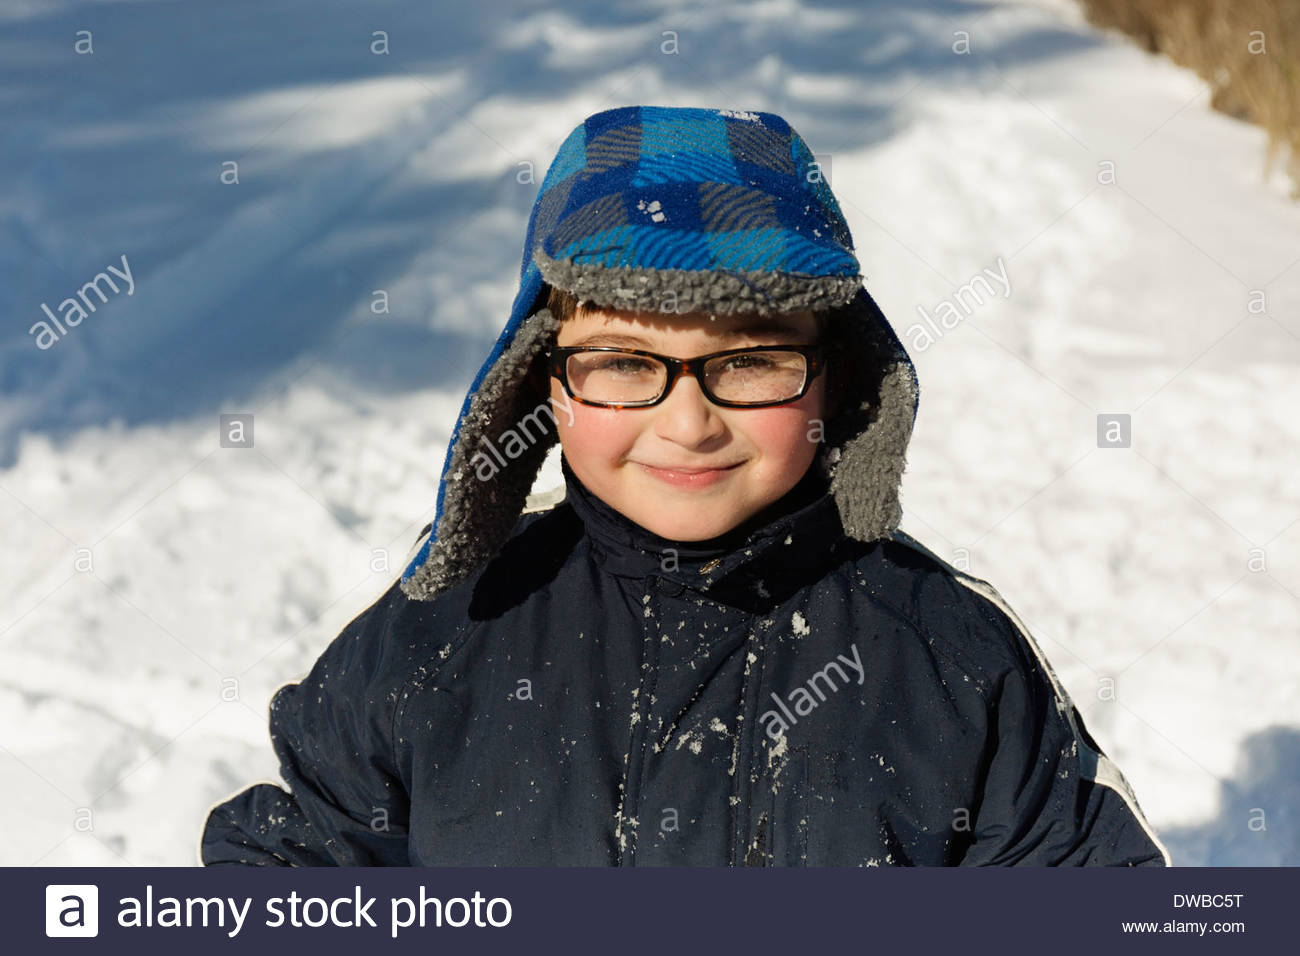 Portrait of boy wearing winter hat, smiling - Stock Image